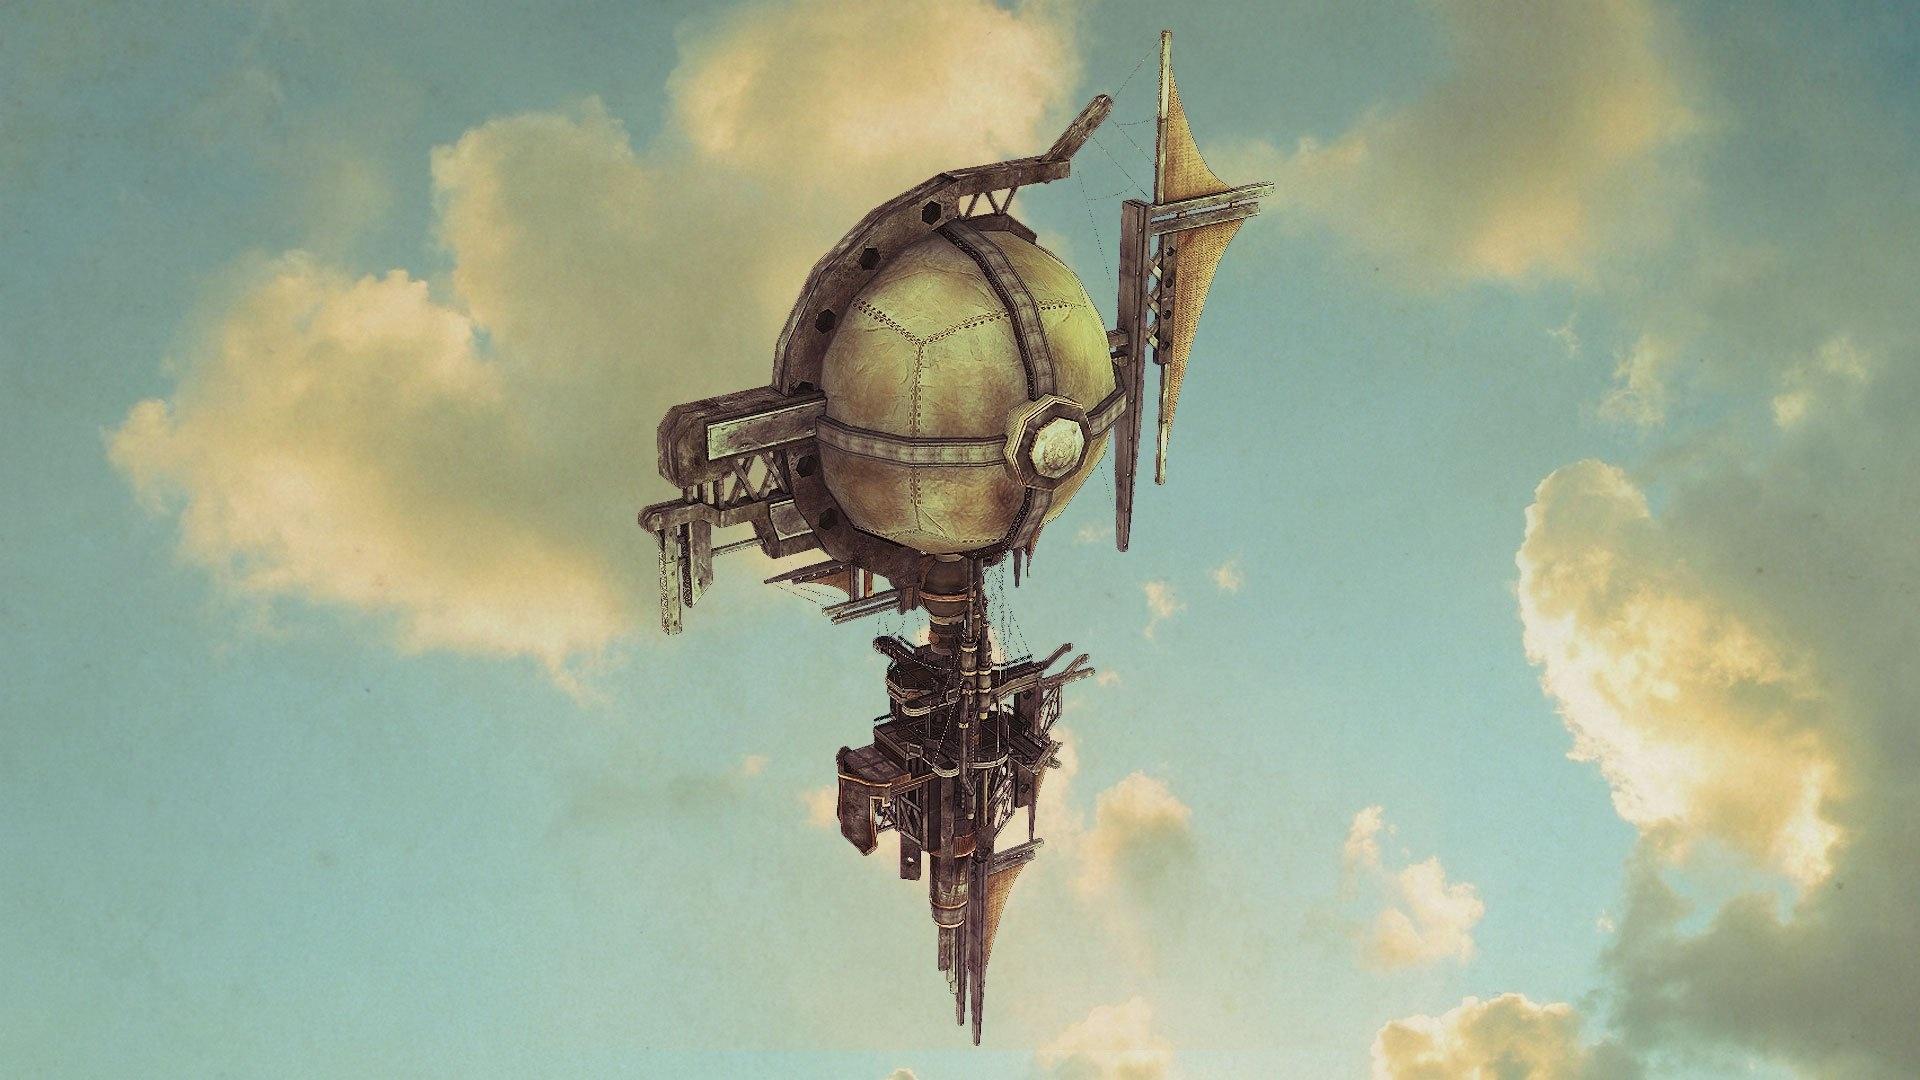 Airship Art desktop wallpaper hd